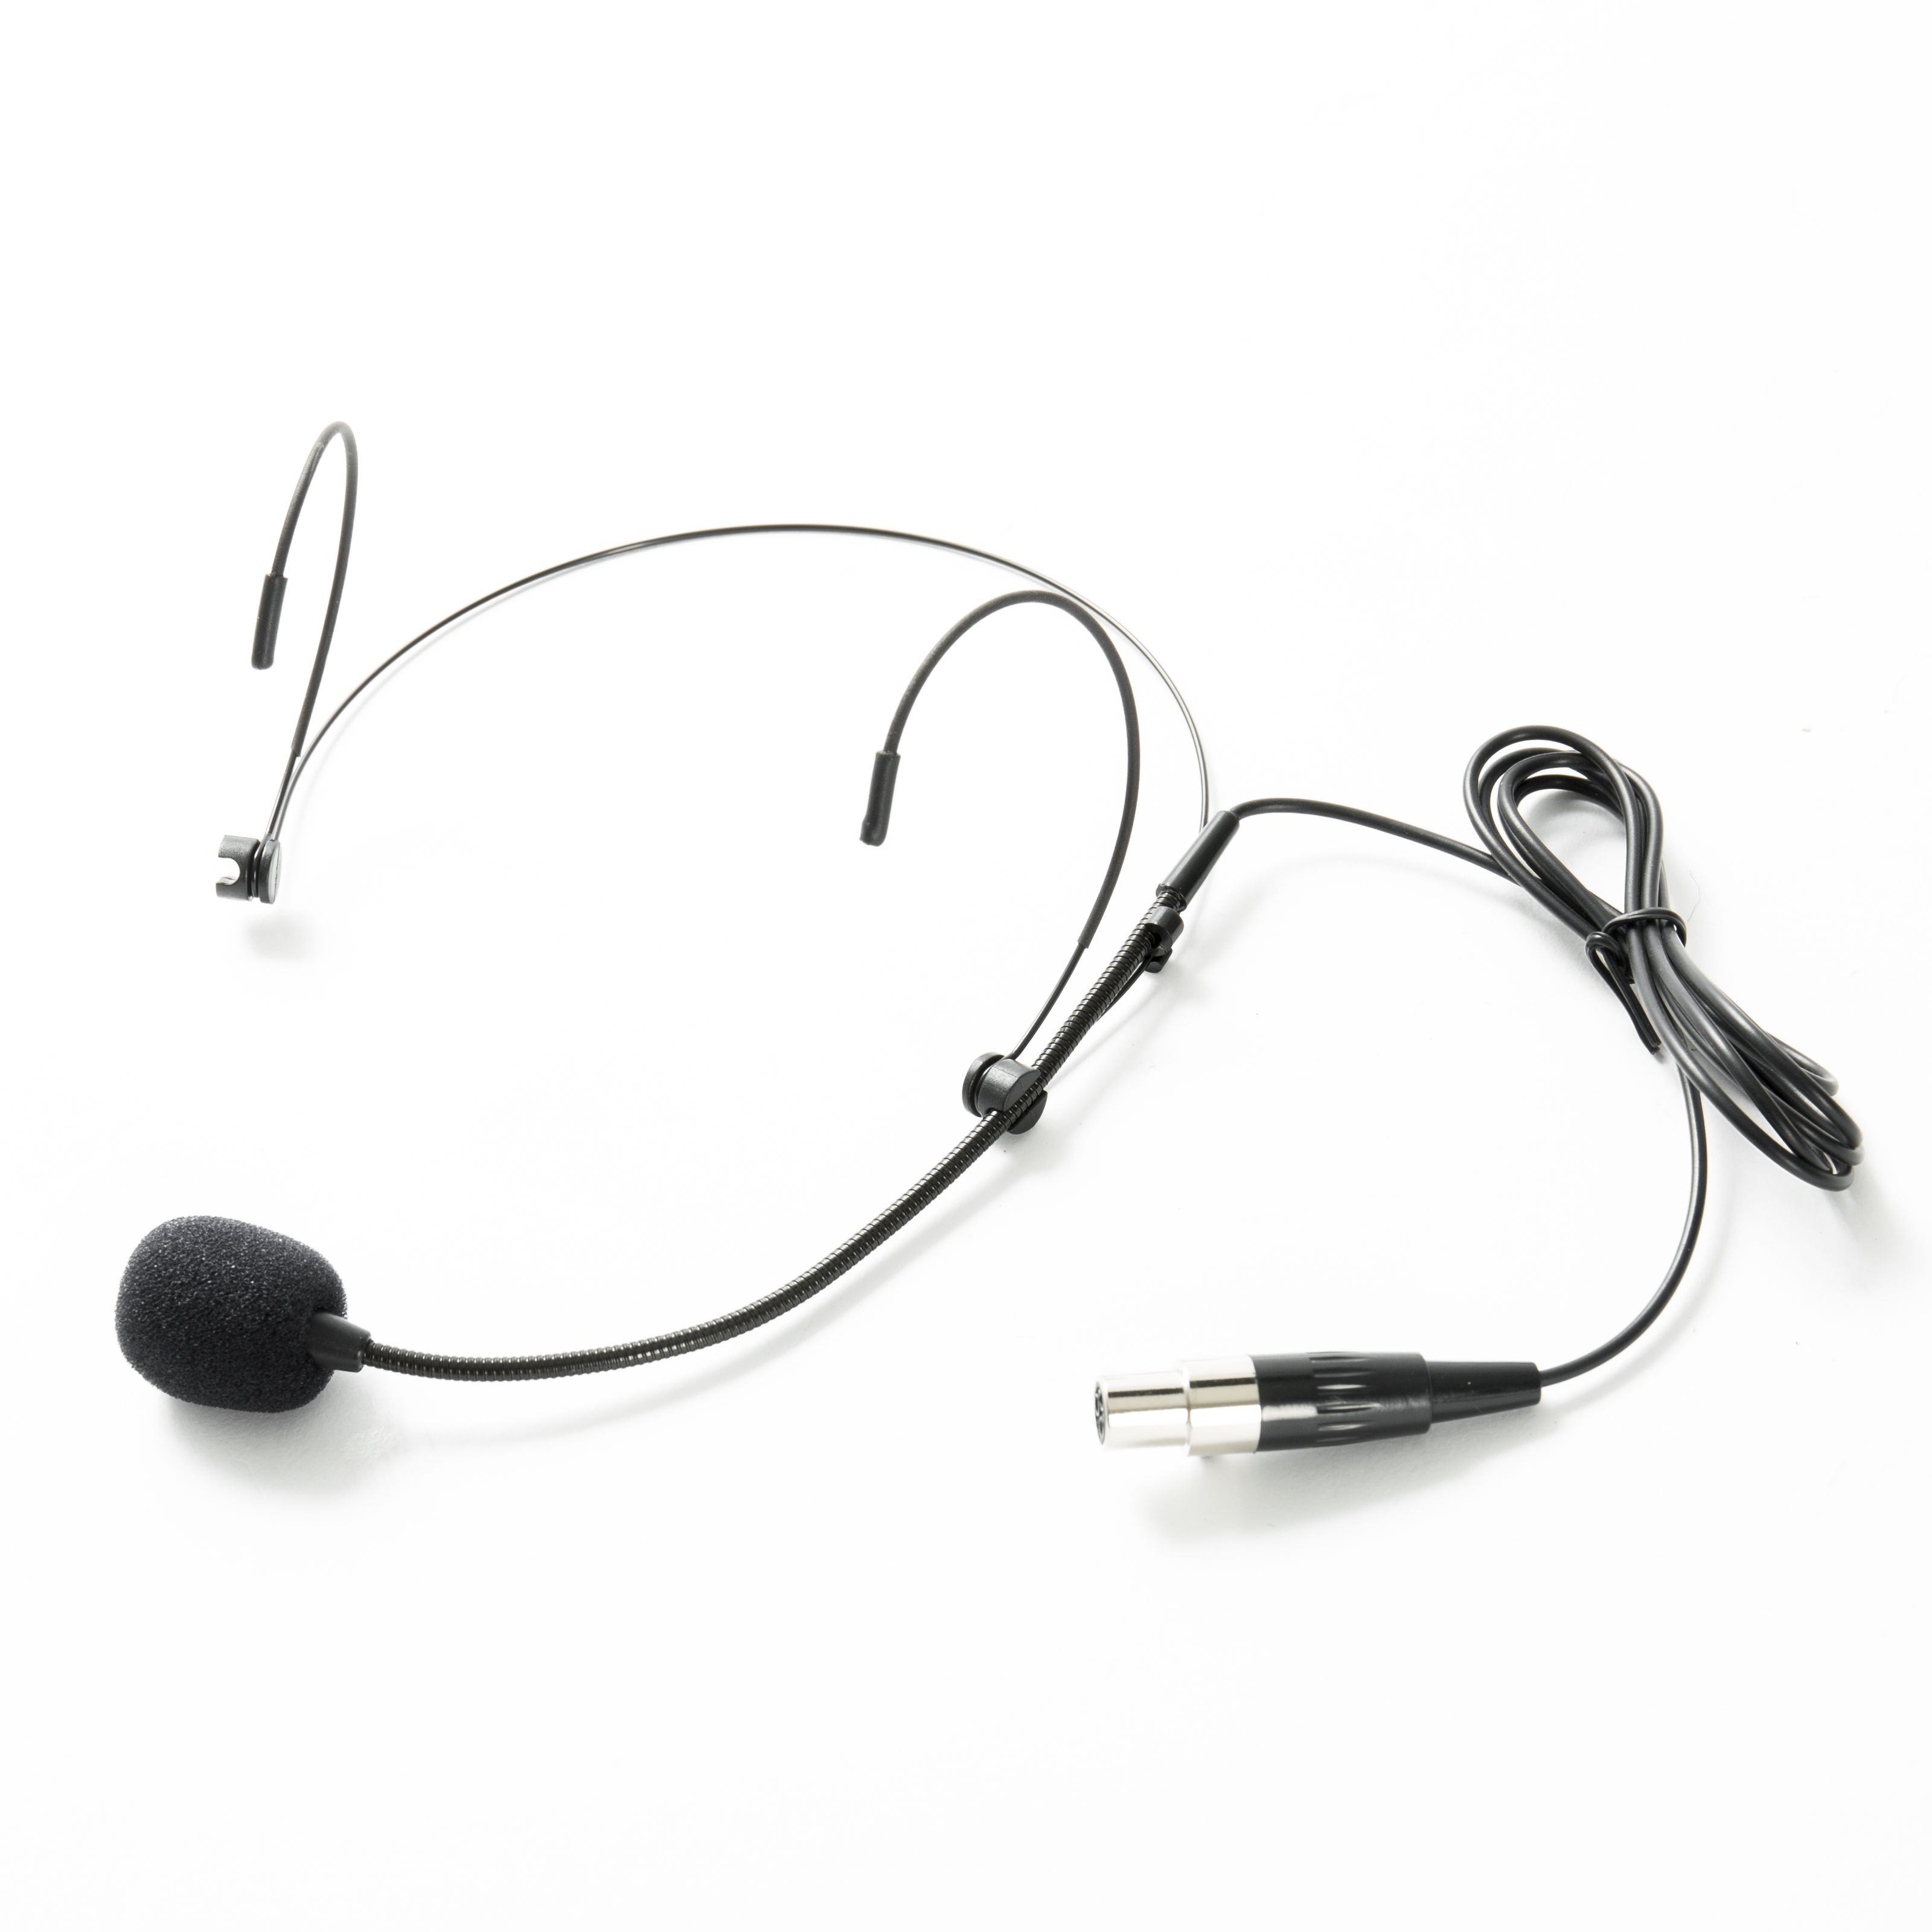 Fame Audio - MSW Pro HS Basic mini XLR Headset, black IH-01 mini XLR